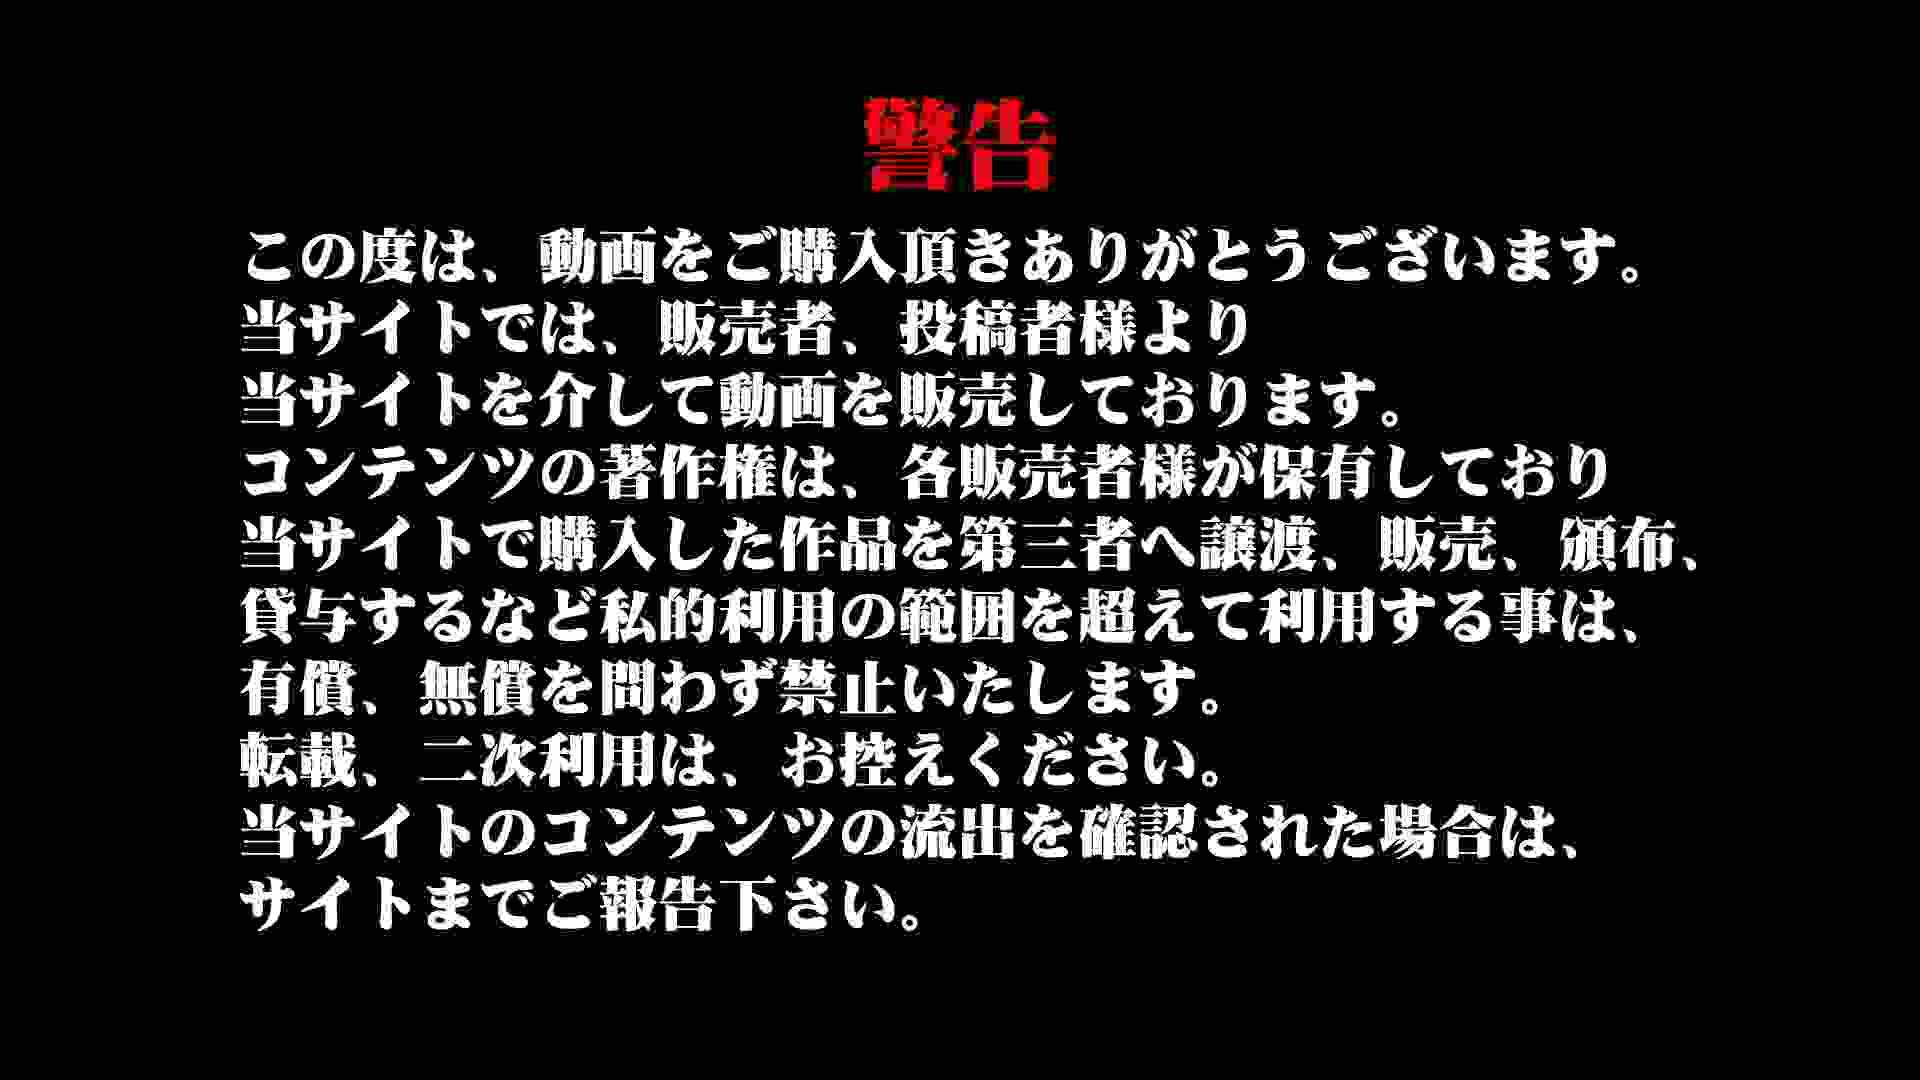 Aquaな露天風呂Vol.867潜入盗撮露天風呂参判湯 其の二 露天風呂編 われめAV動画紹介 102PIX 2